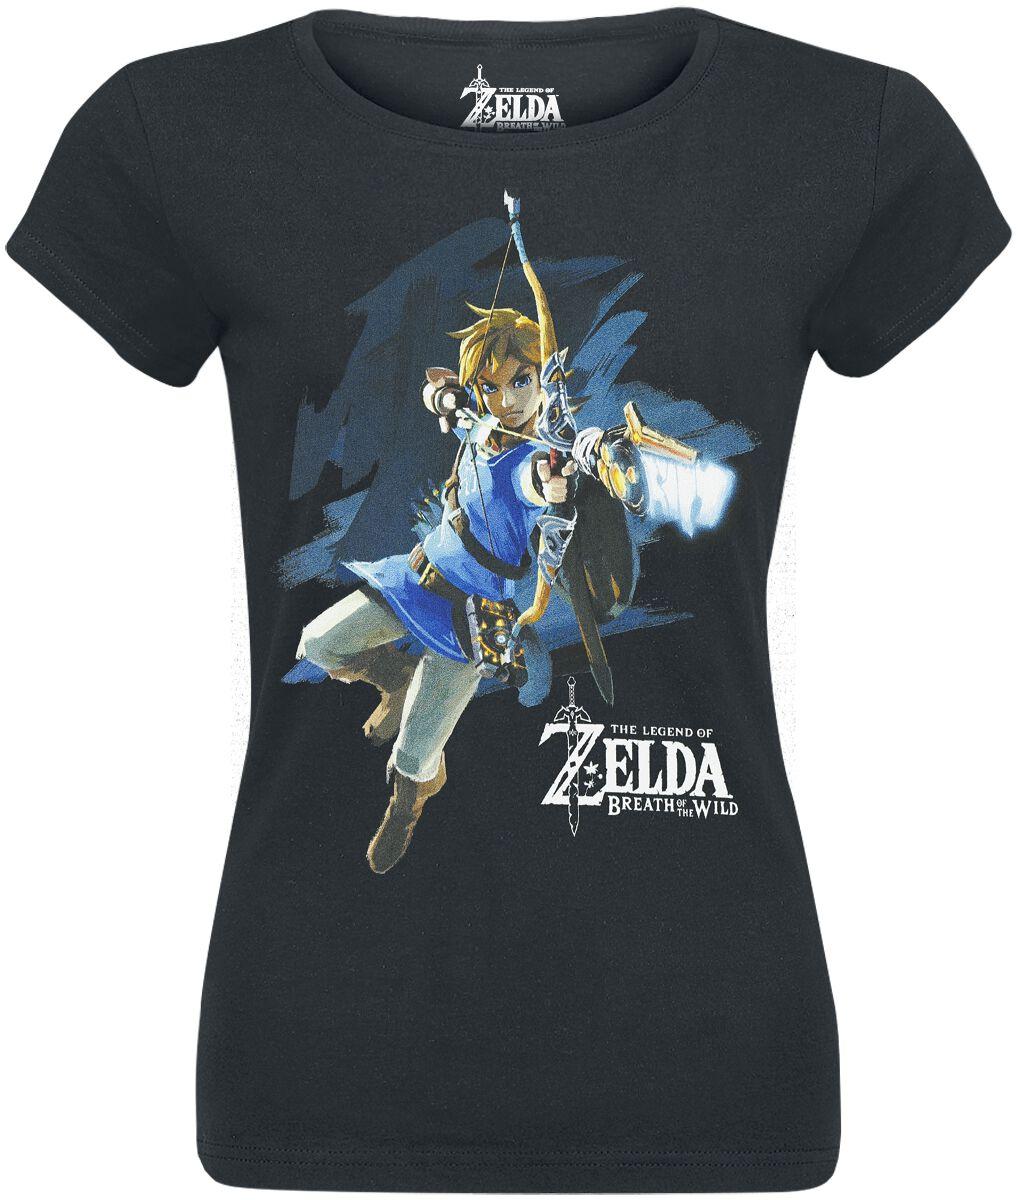 Image of   The Legend Of Zelda Breath Of The Wild - Link With Arrow Girlie trøje sort